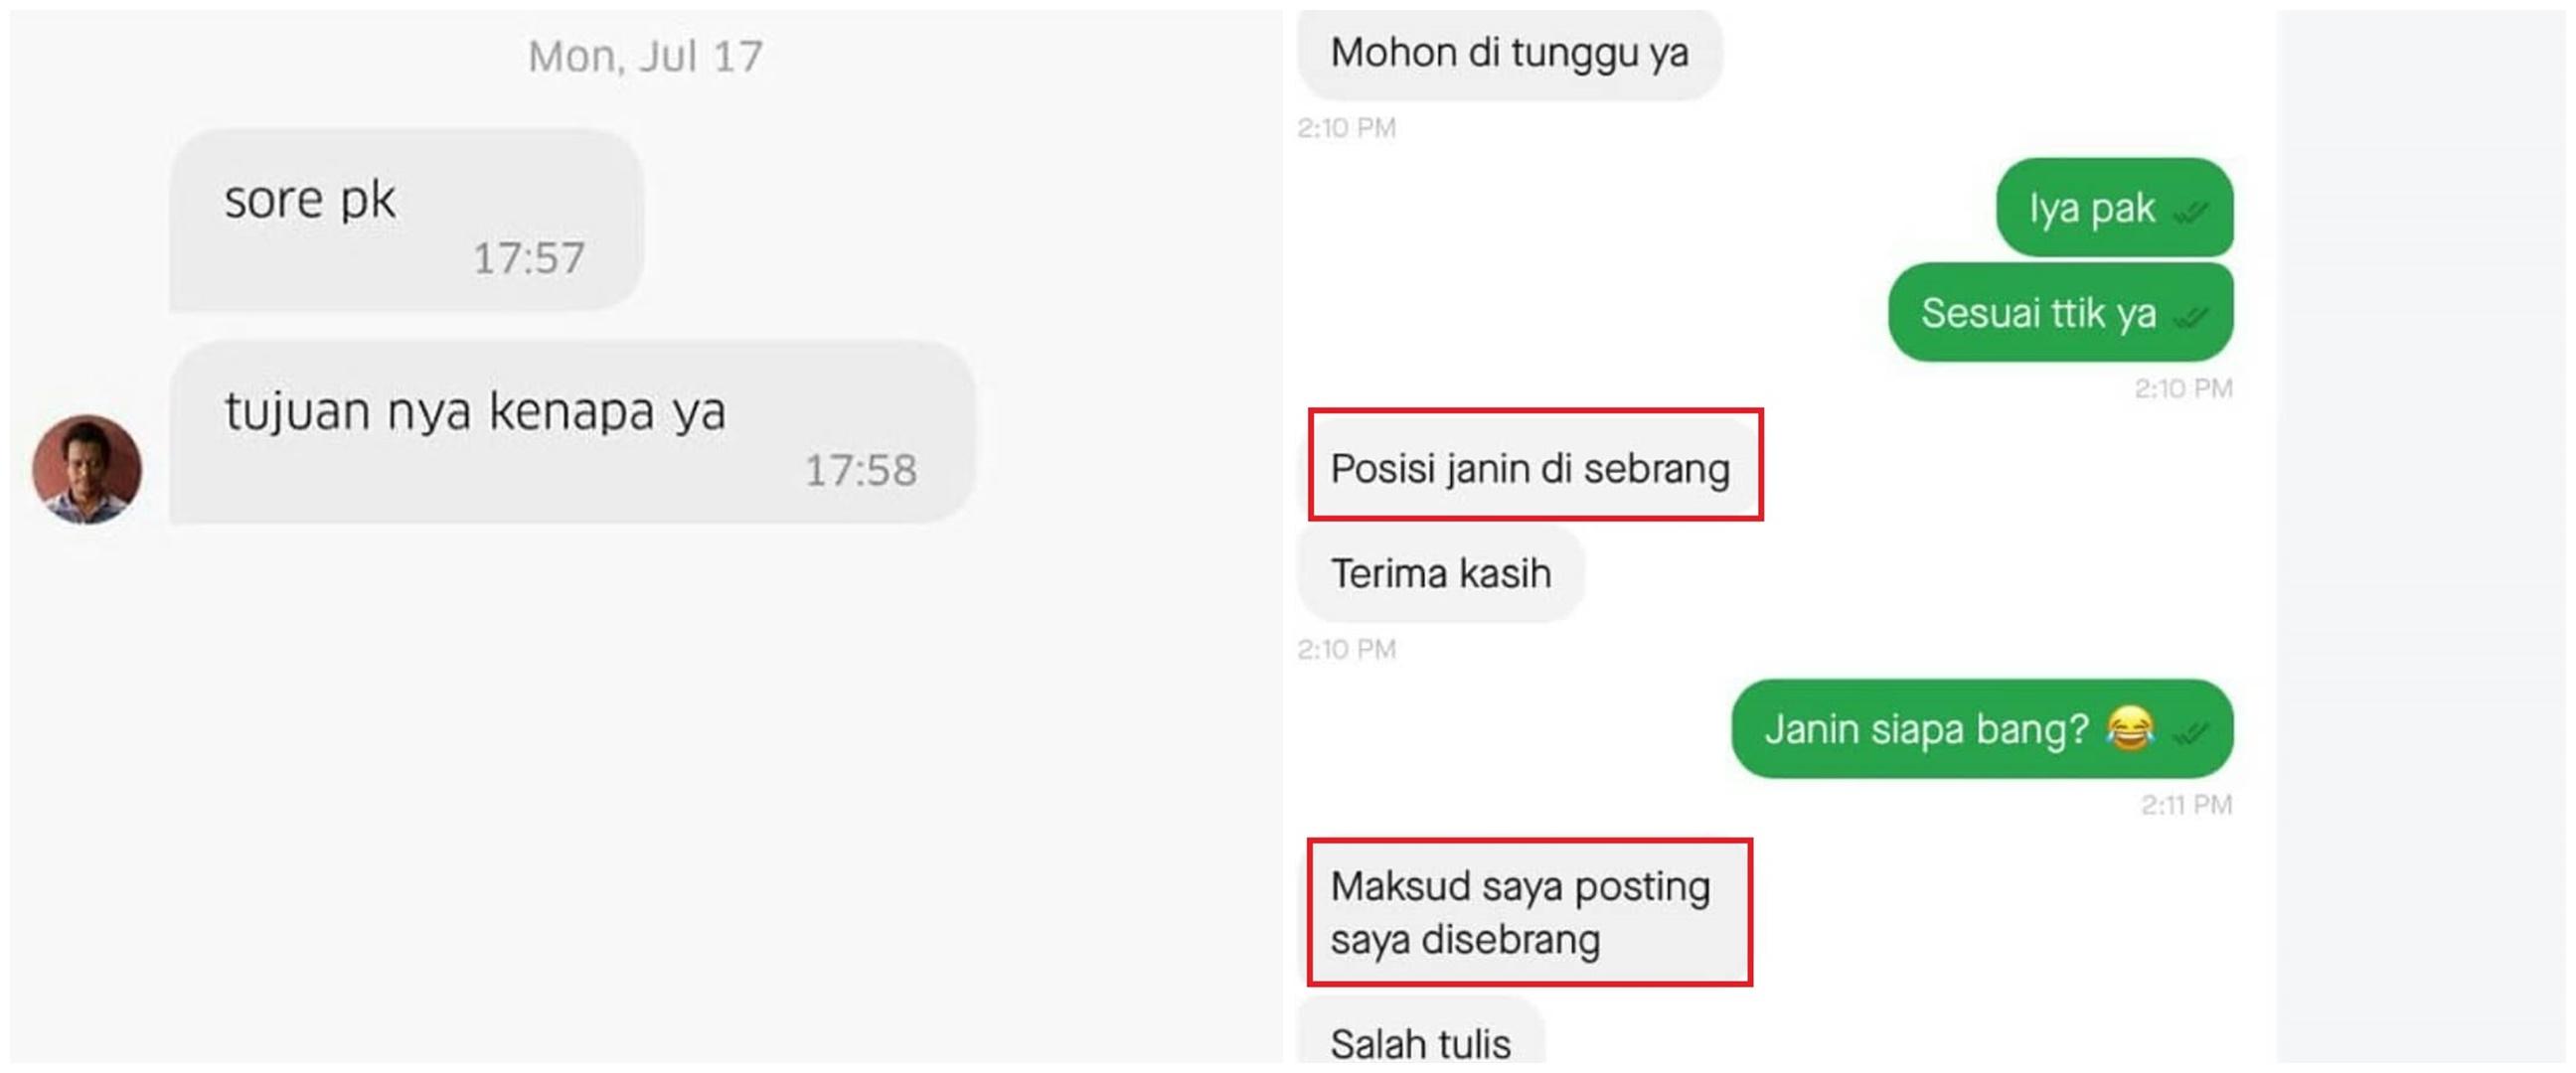 10 Chat typo lokasi penjemputan ojek online ini bikin salah paham